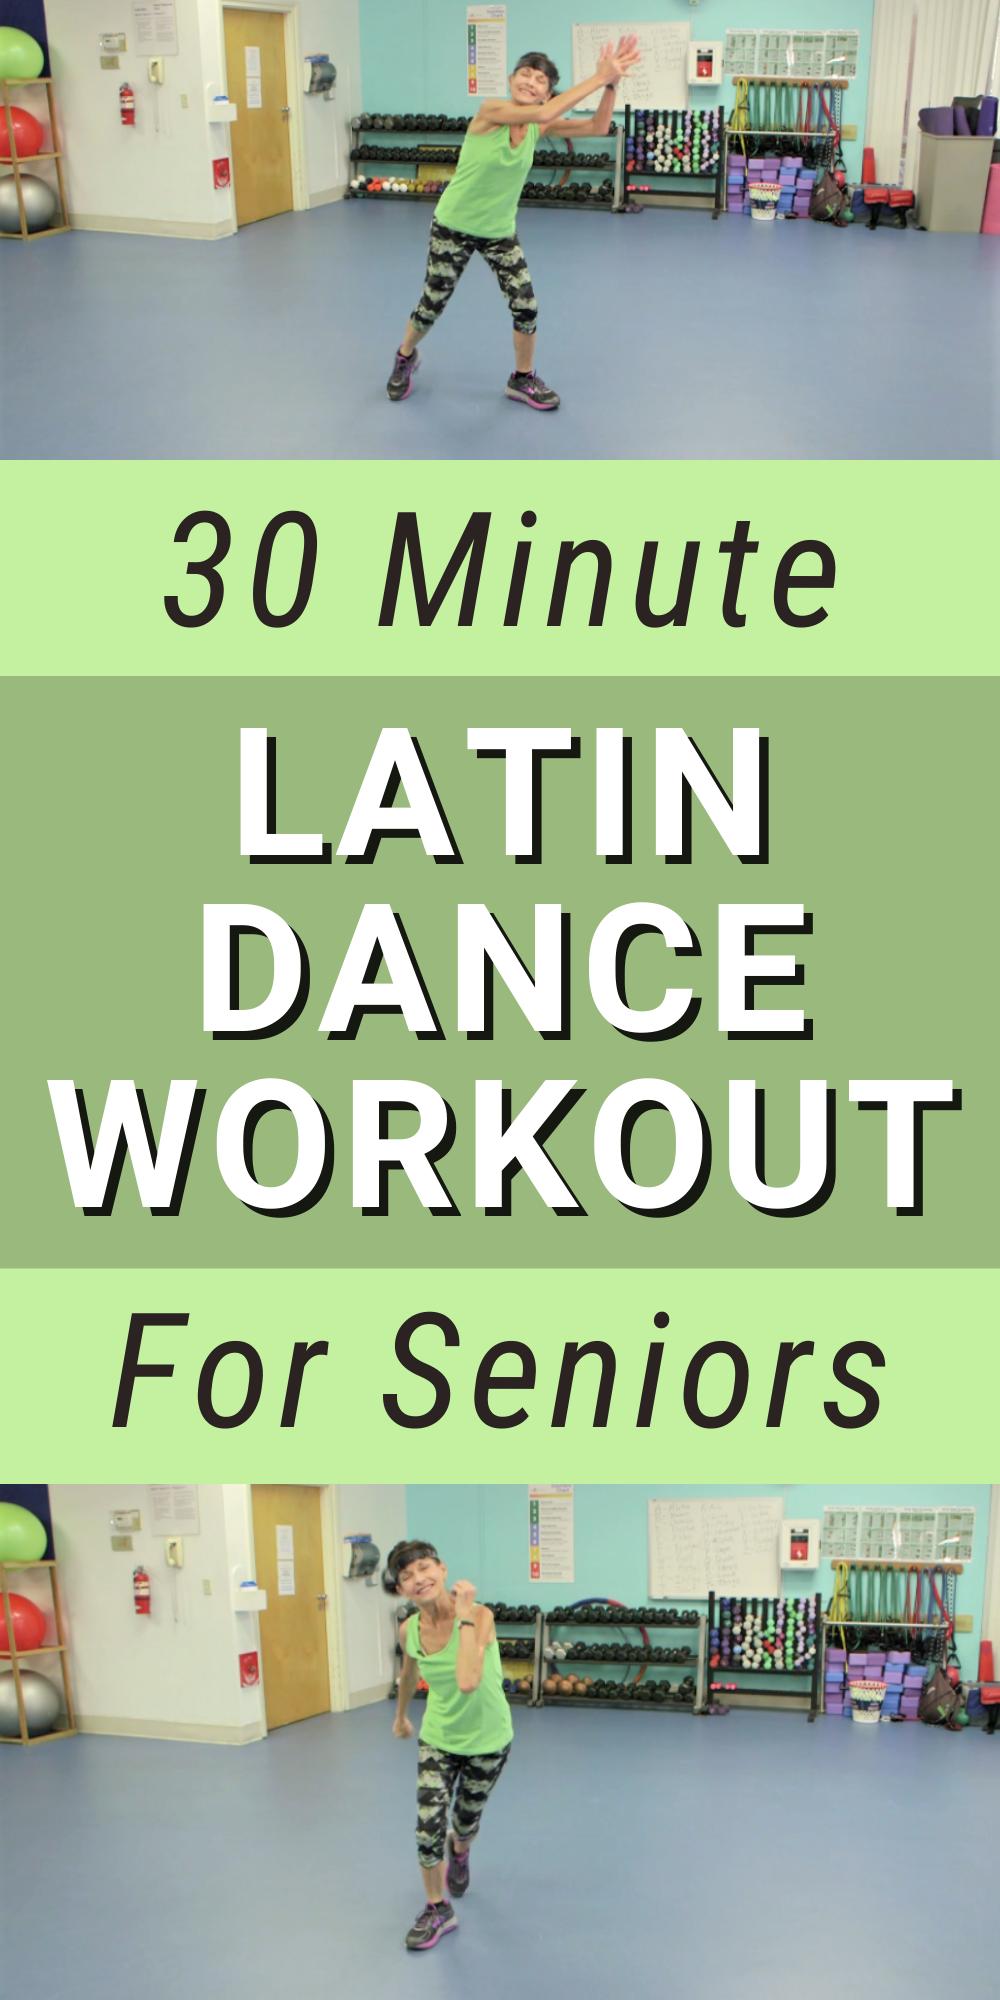 Latin Dance Workout for Seniors